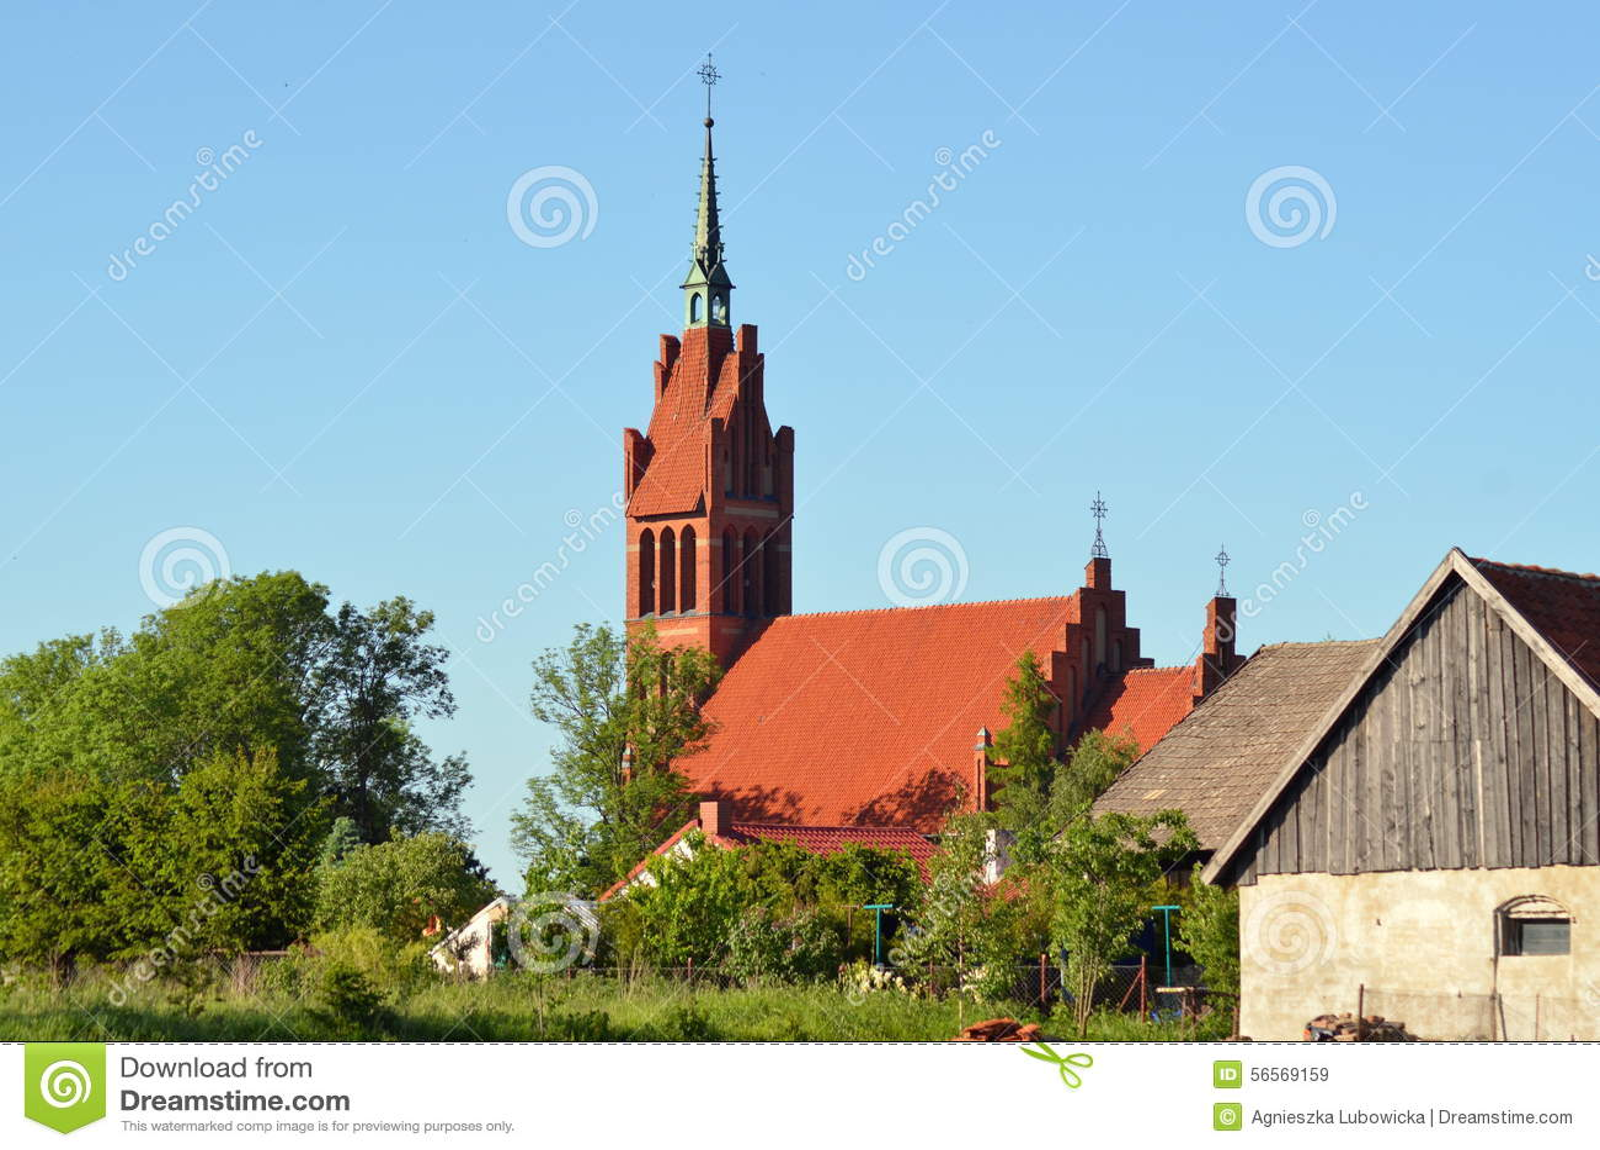 Download Όψη στοκ εικόνα. εικόνα από χωριό, εκκλησία, πύργος, όψη - 56569159